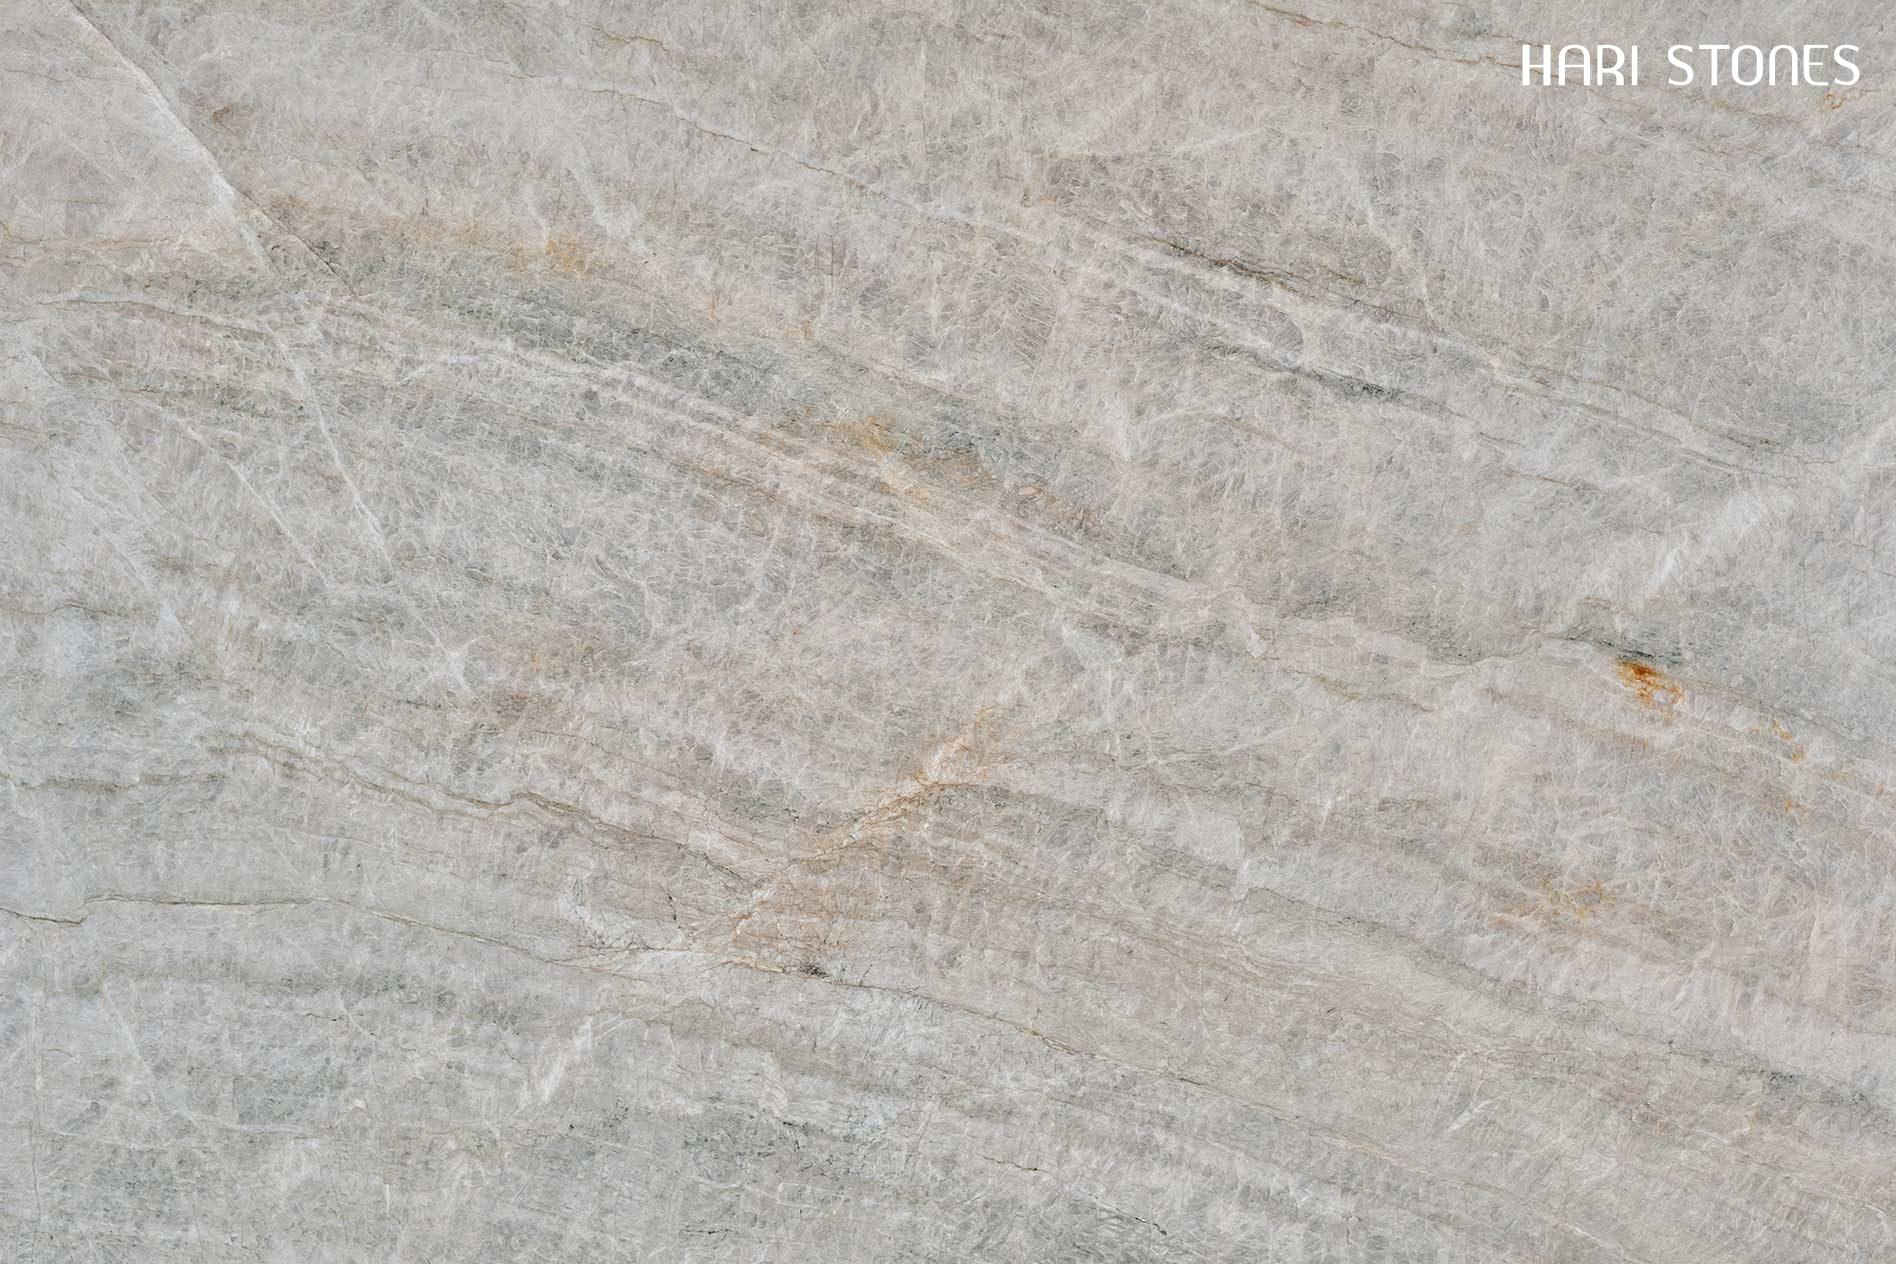 Madre Perola Granite Slabs Vancouver